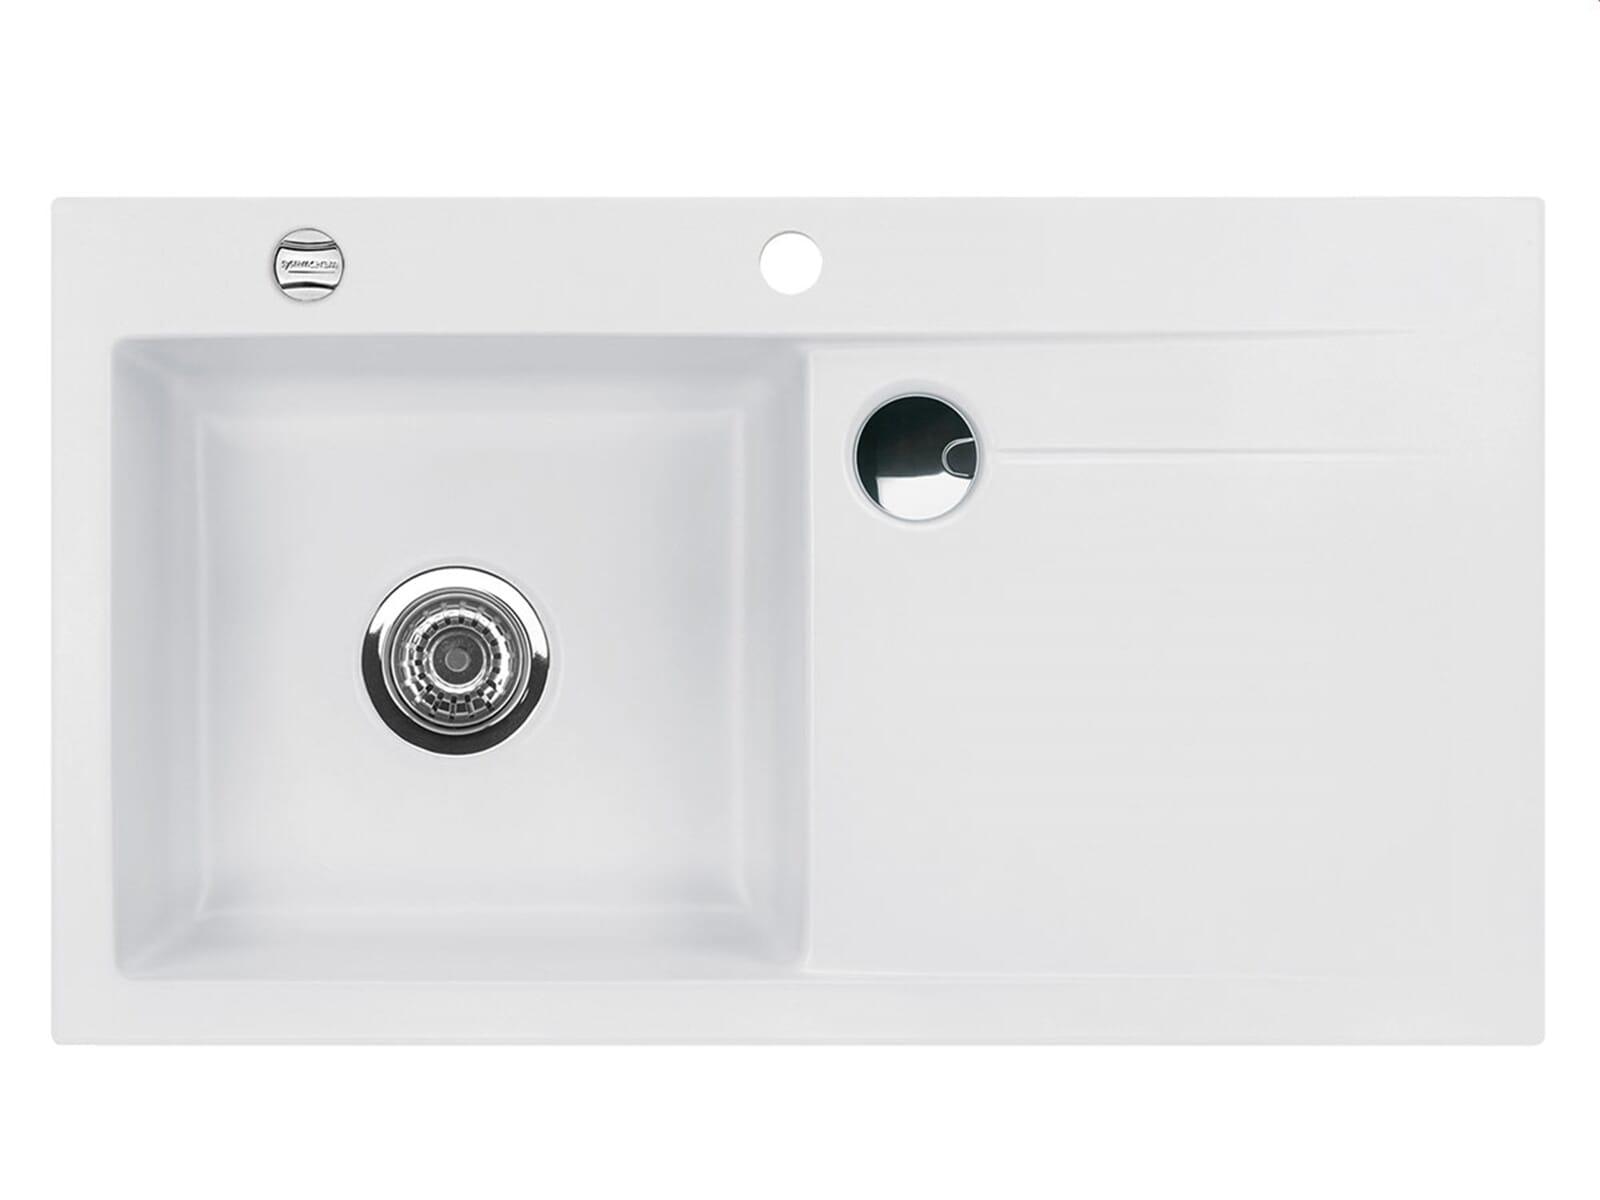 Systemceram Stema 90 Satin Keramikspüle Excenterbetätigung